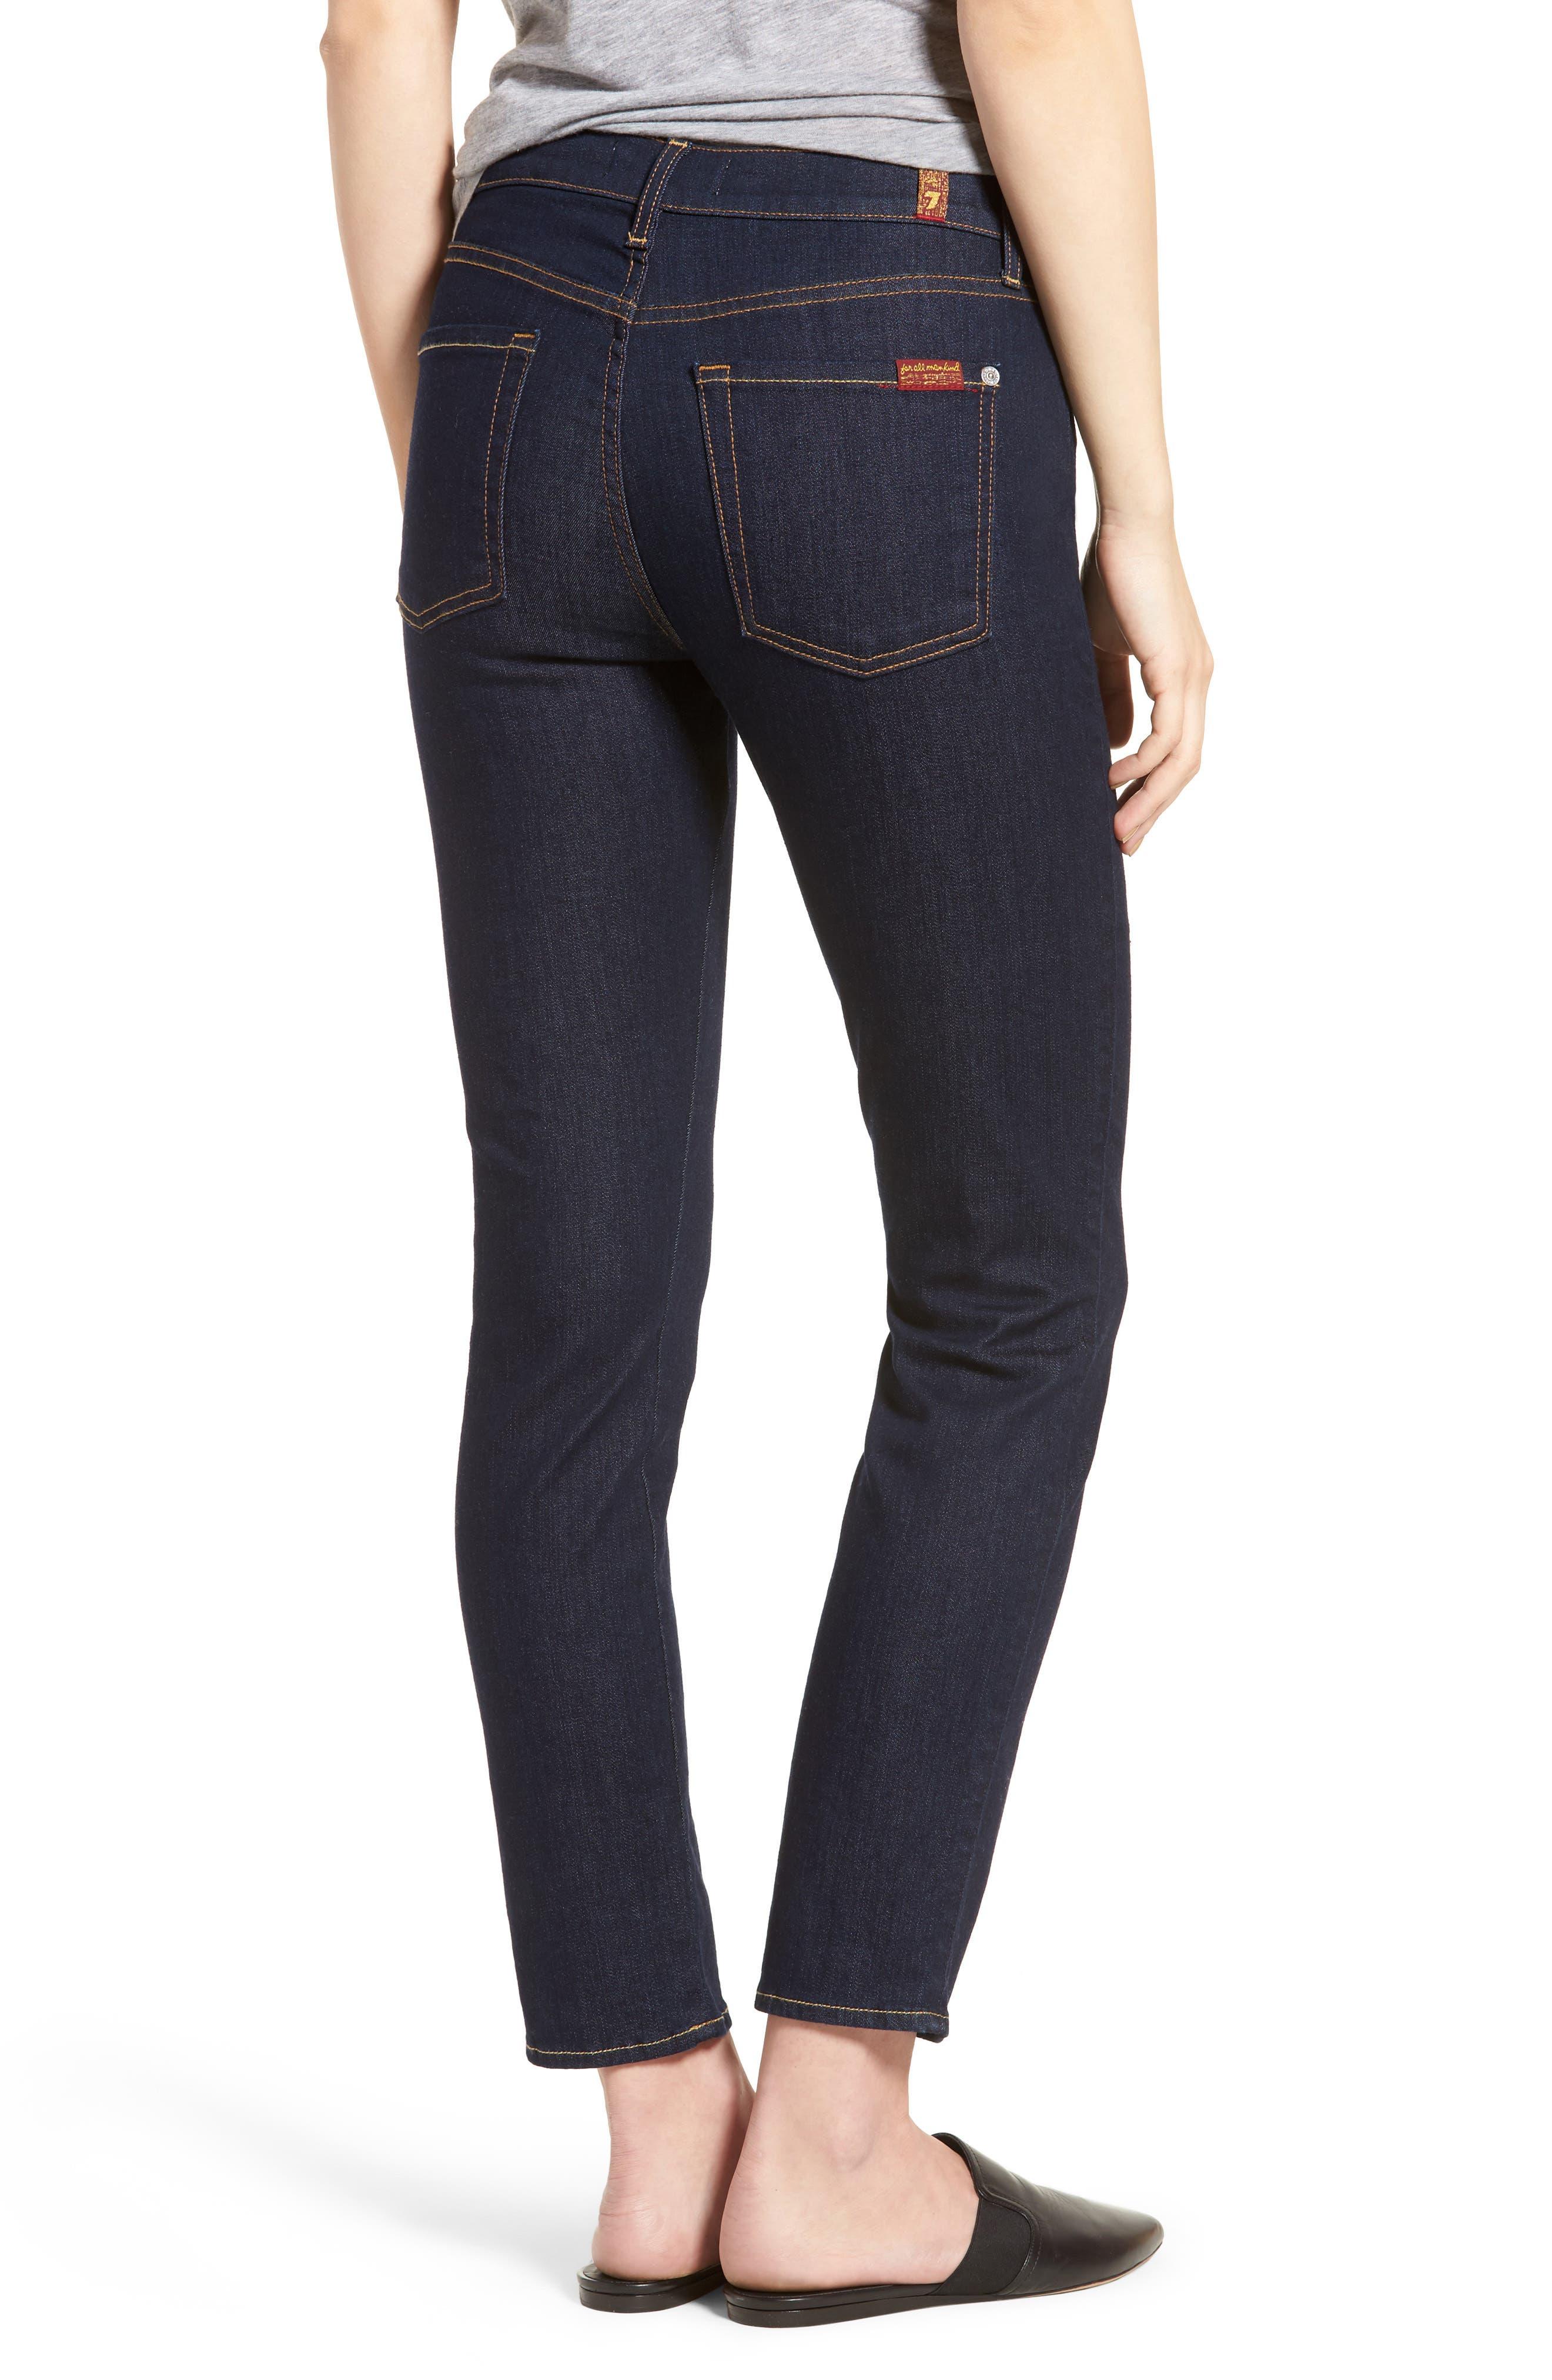 b(air) Roxanne Ankle Skinny Jeans,                             Alternate thumbnail 2, color,                             401